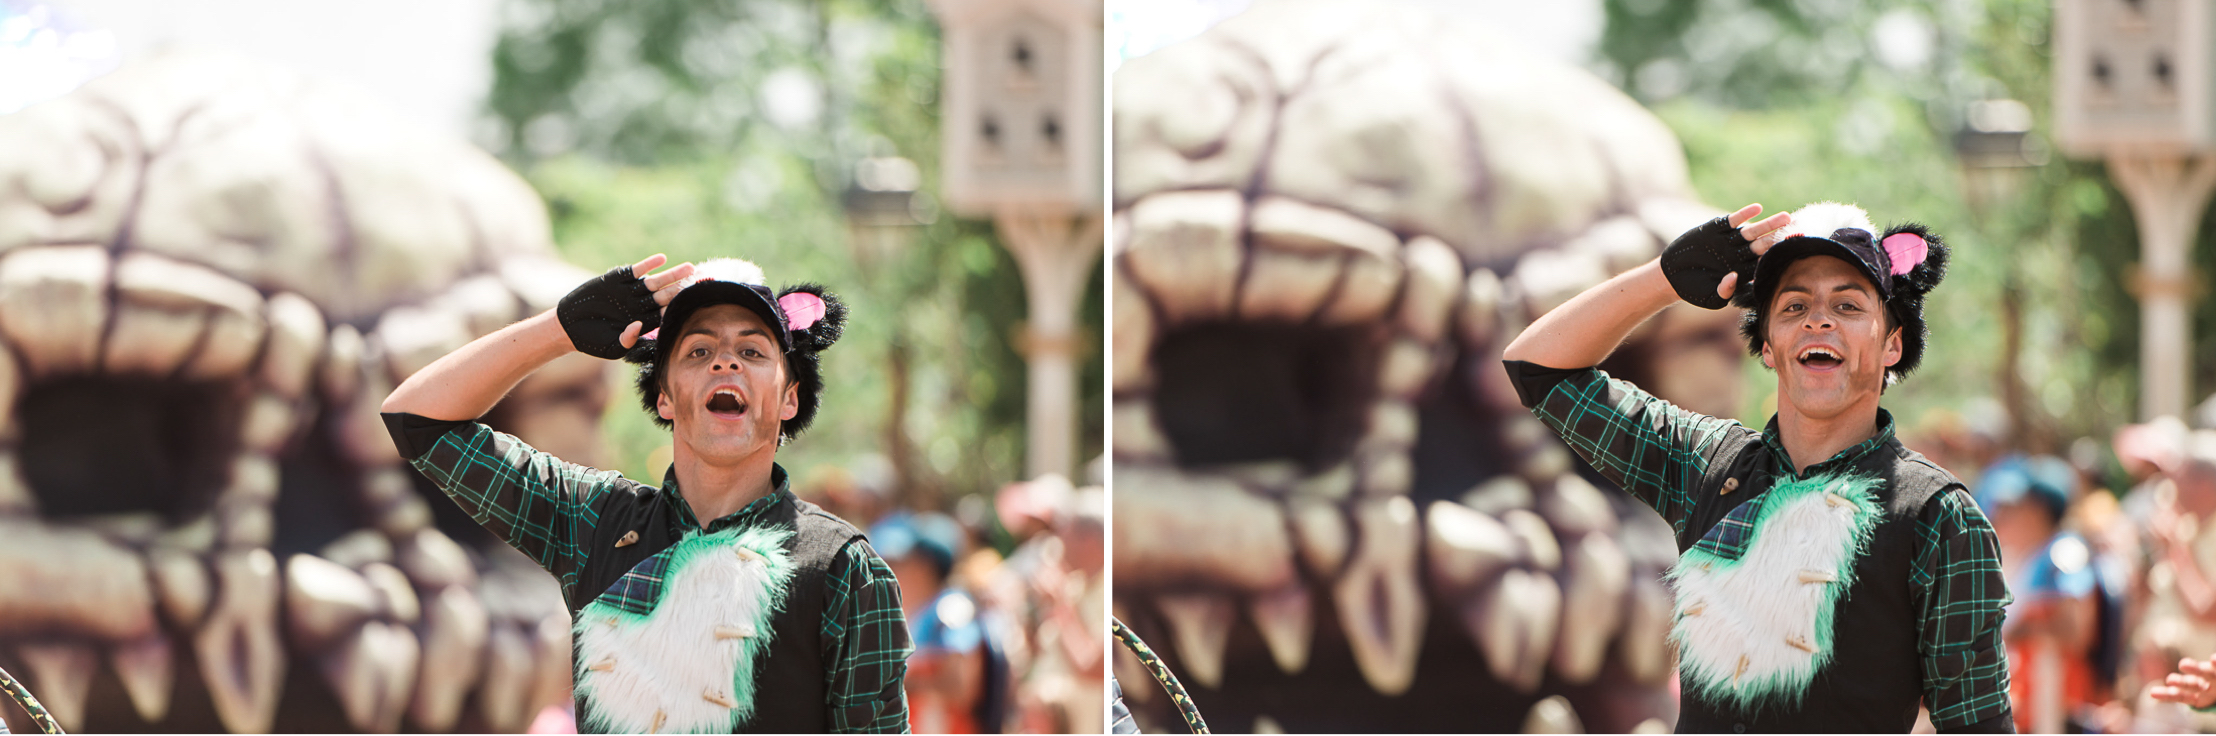 KateTaramykinStudios-Disney-World-Photographer-May-2017-15.jpg